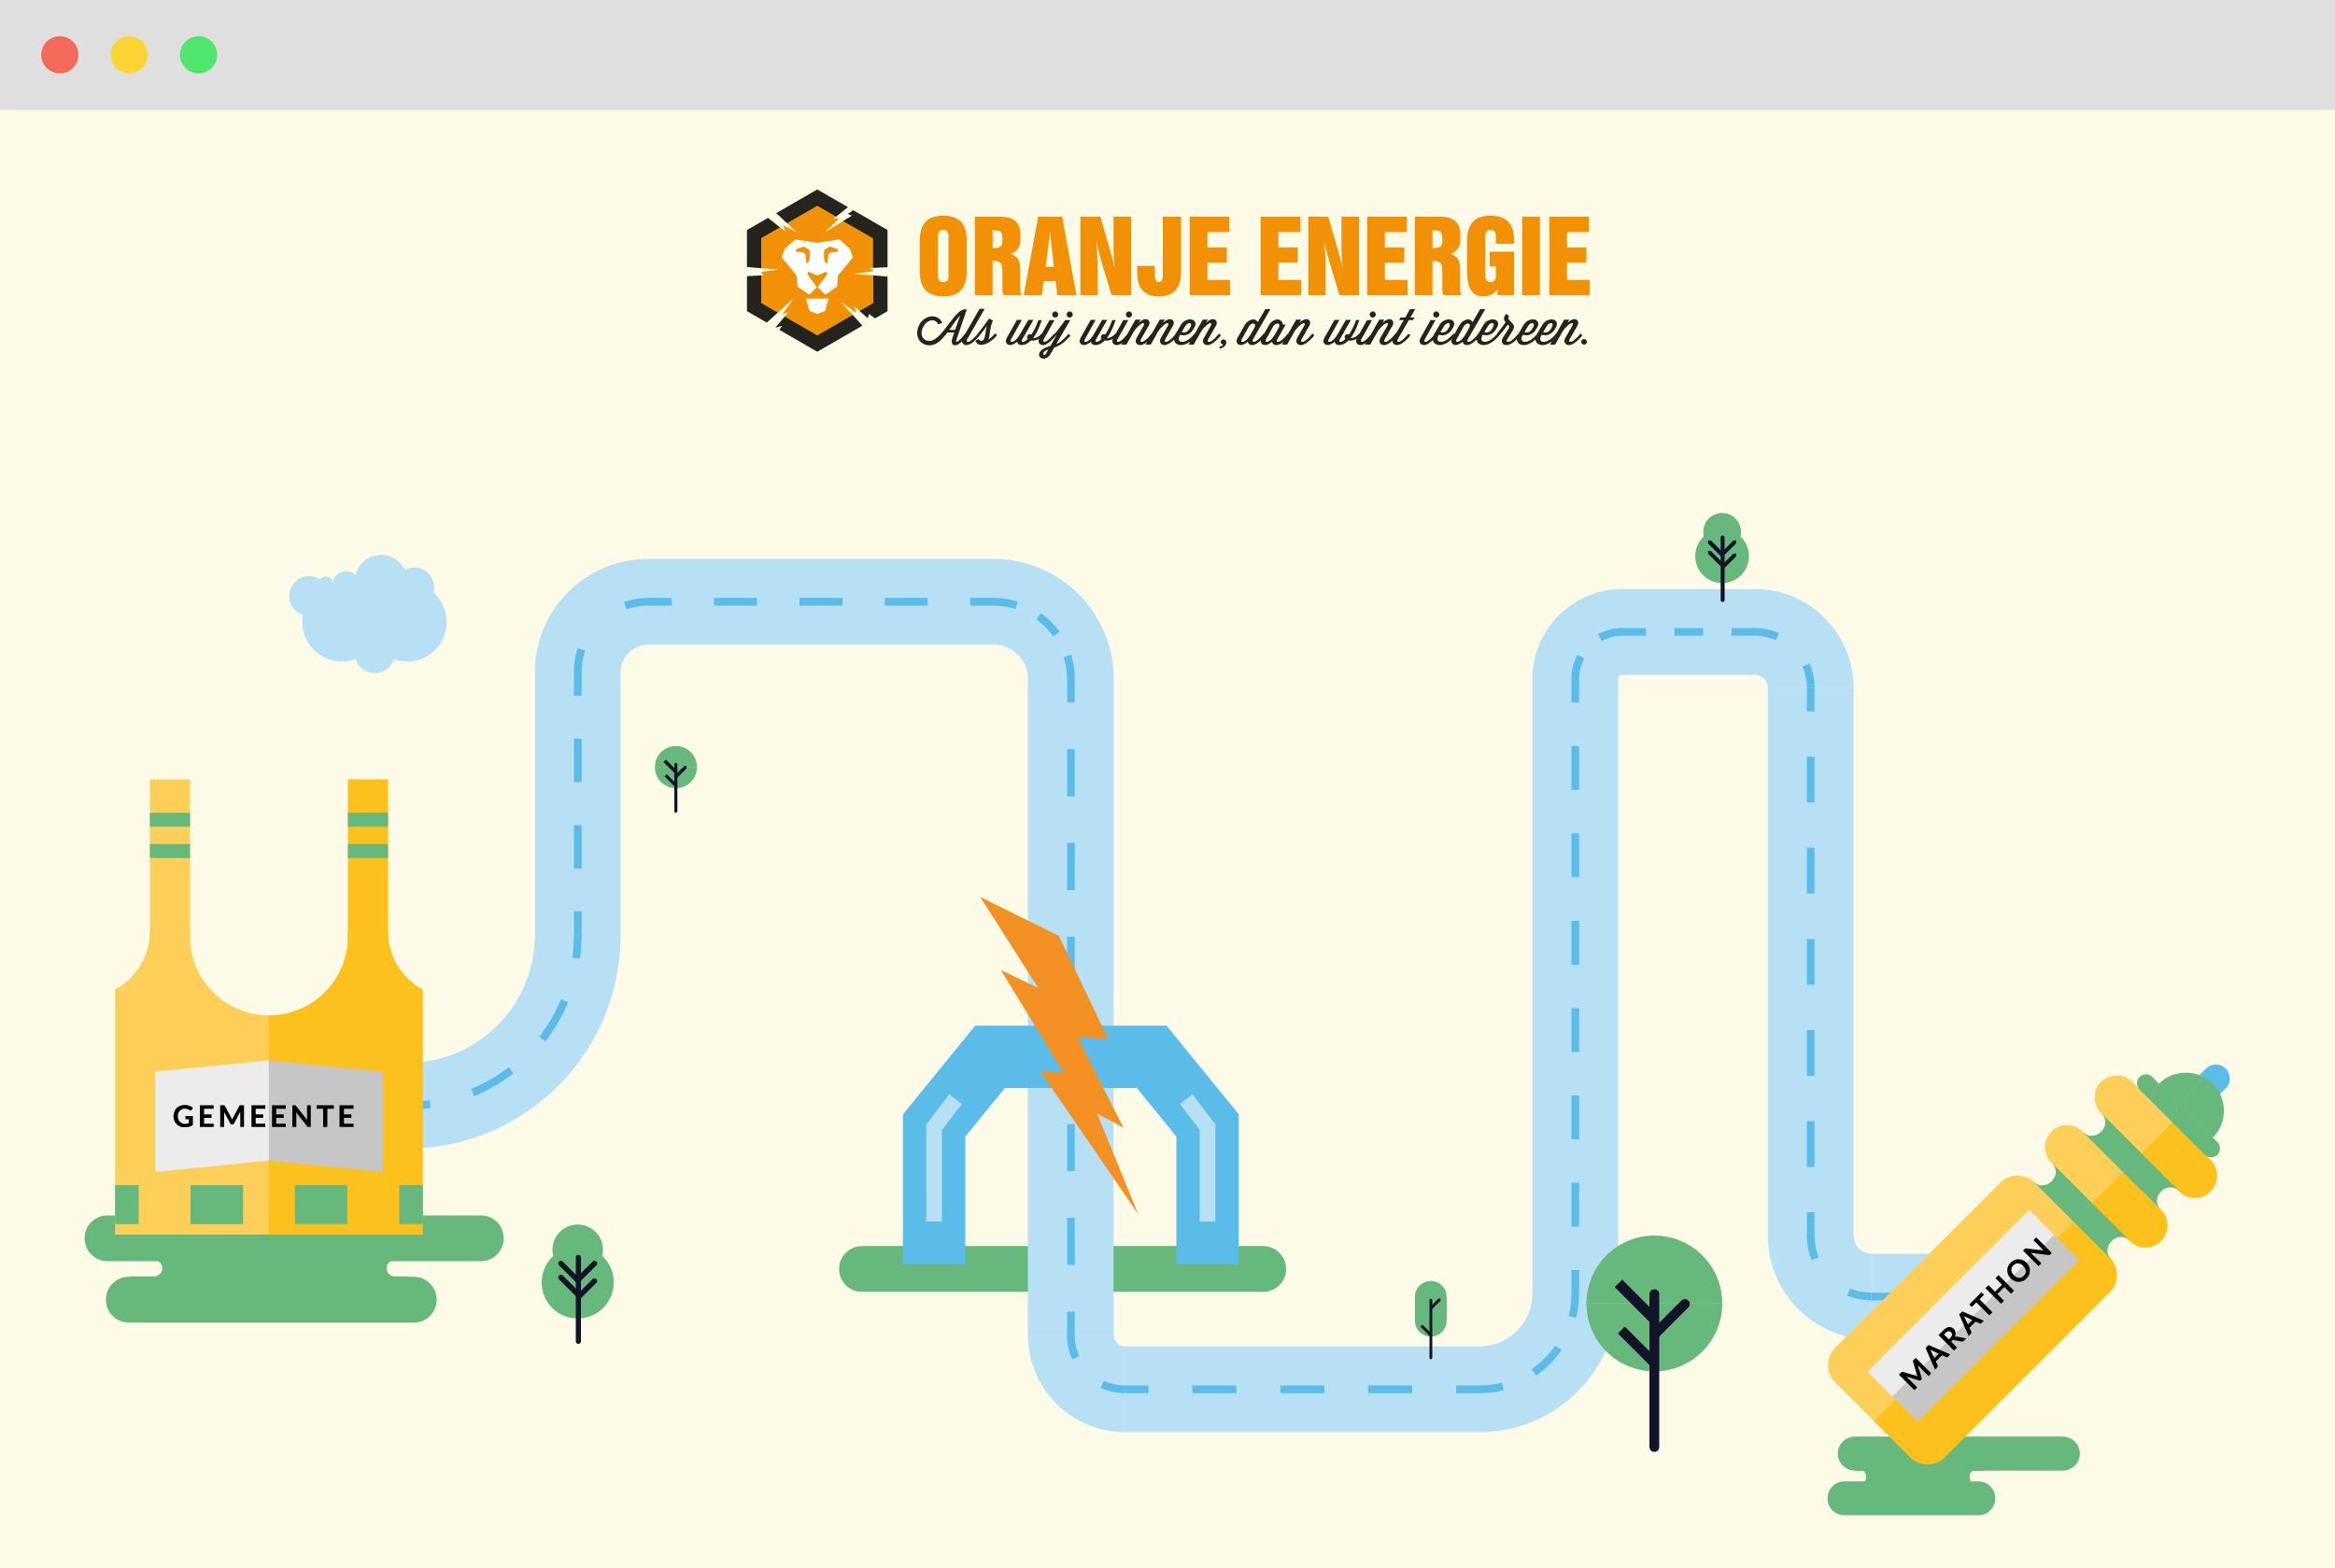 Oranje Energie